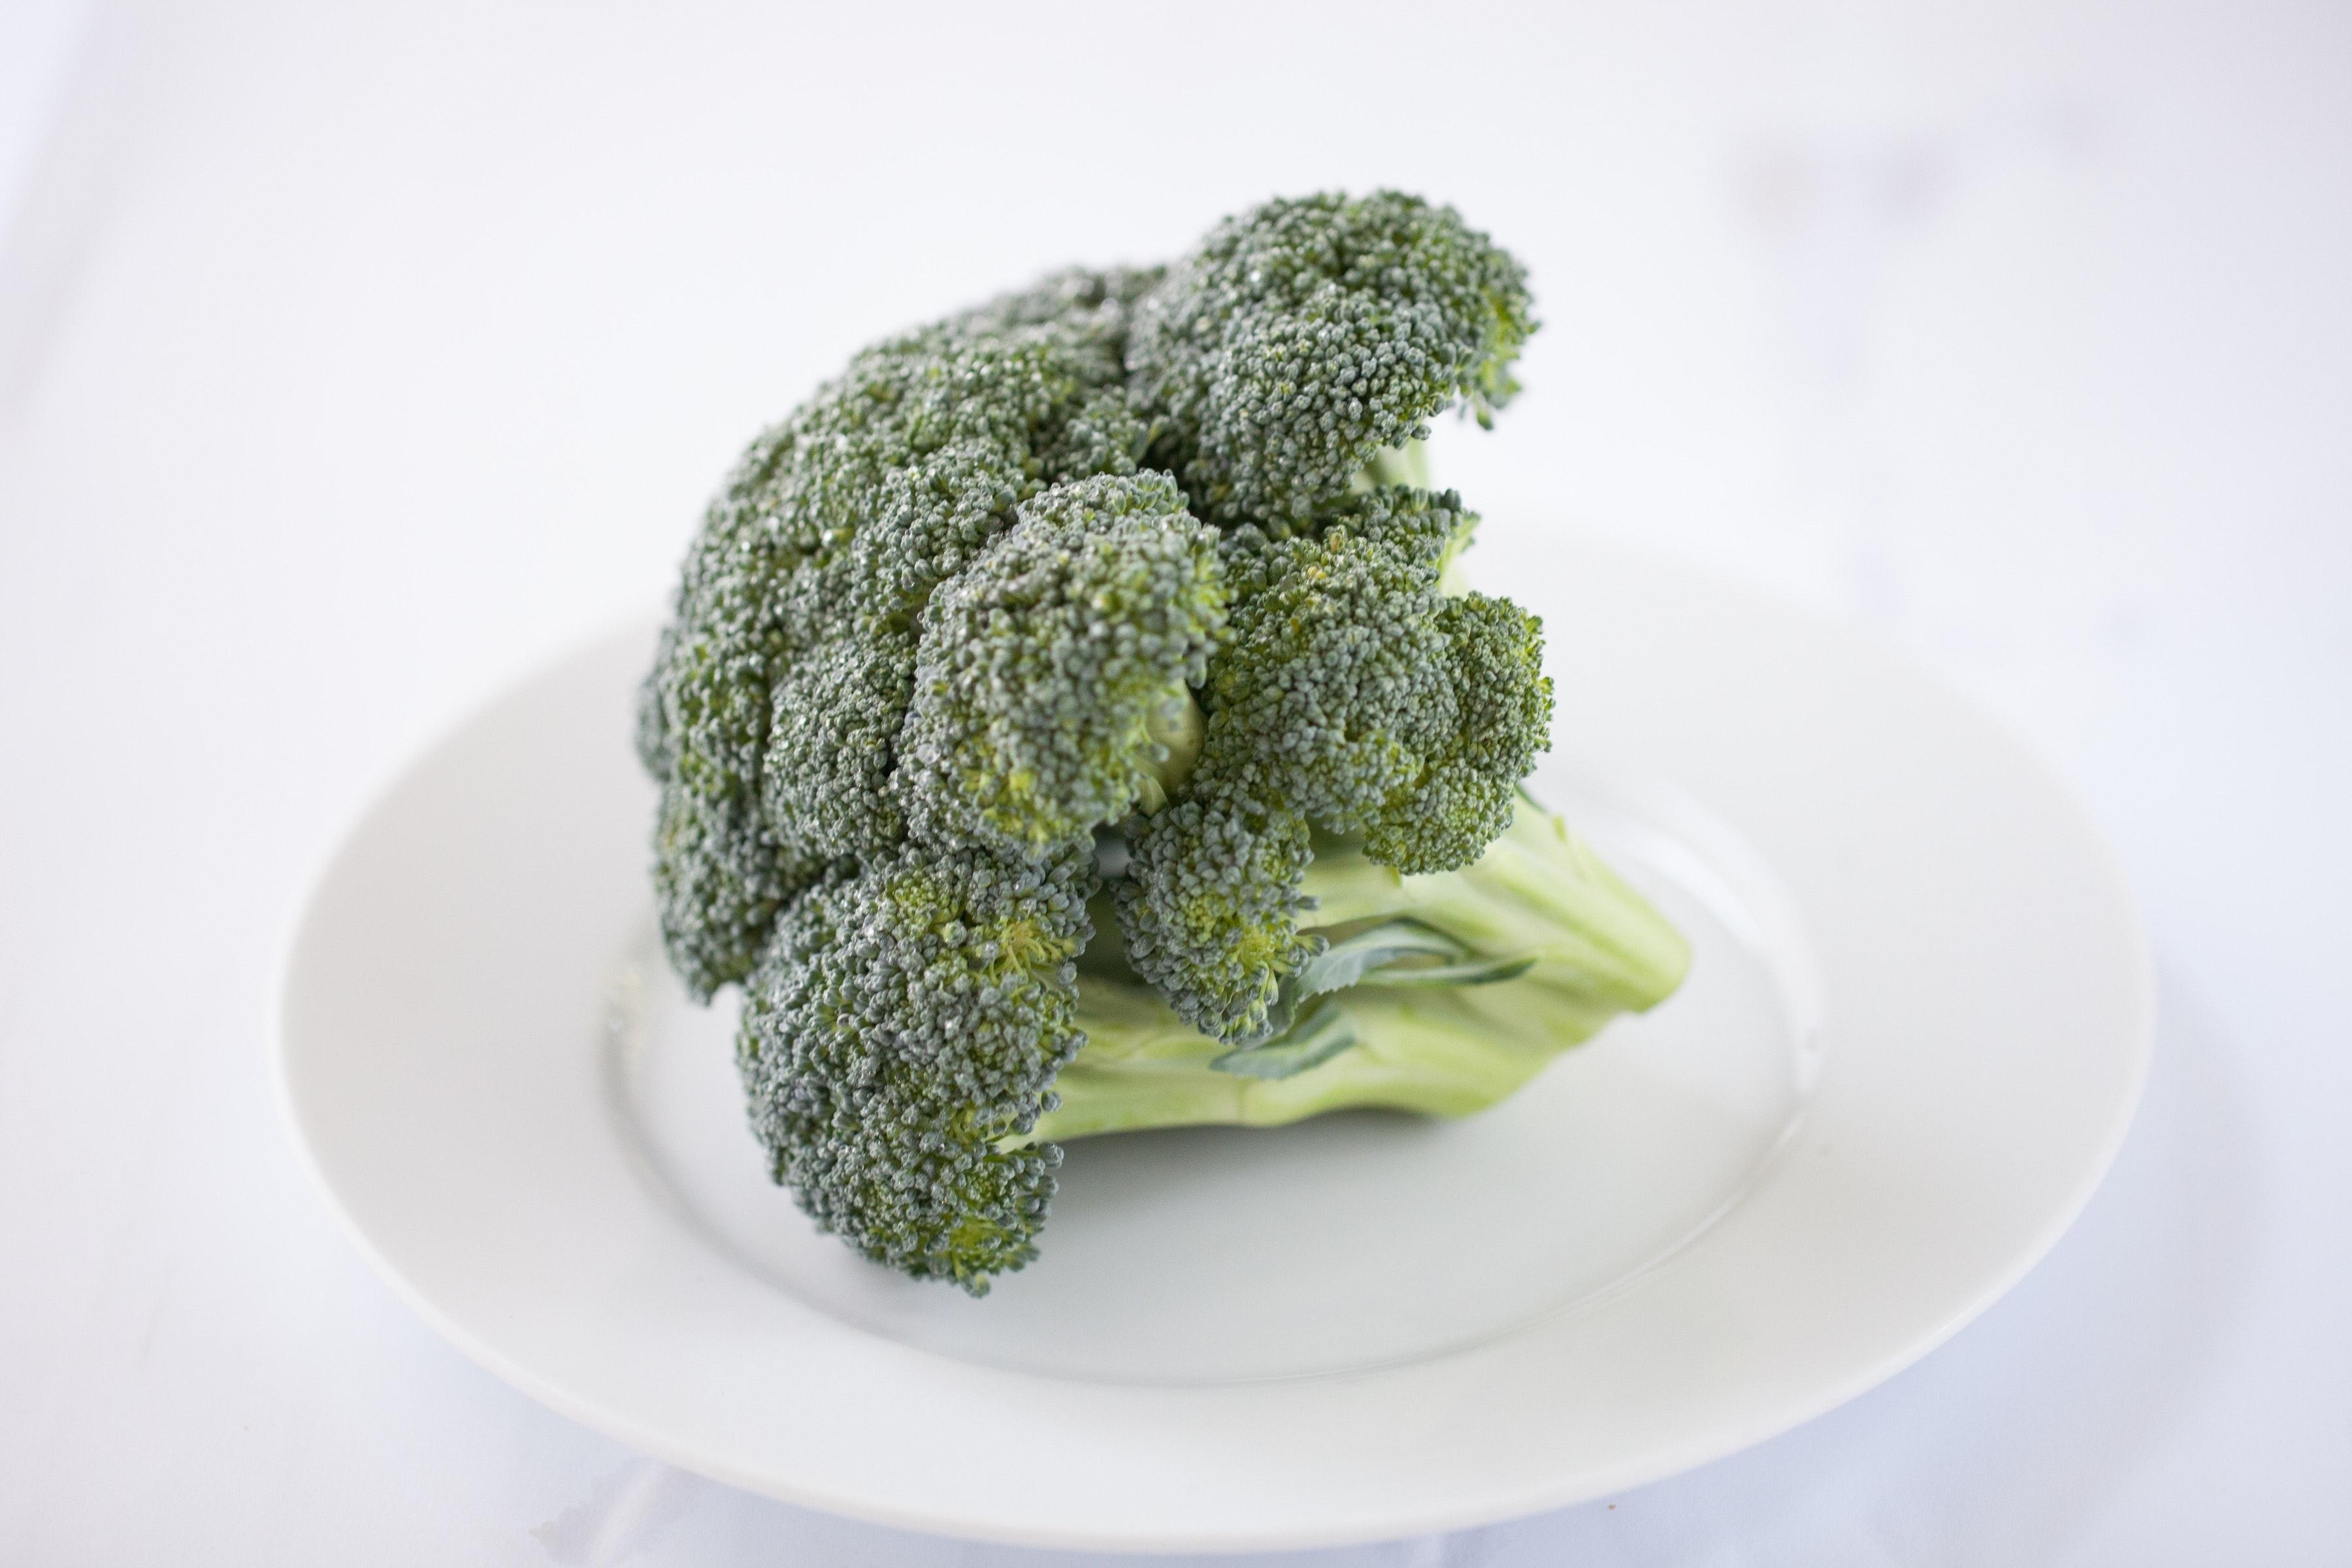 Broccoli, Nutrition, Meal, Health, Plate, HQ Photo